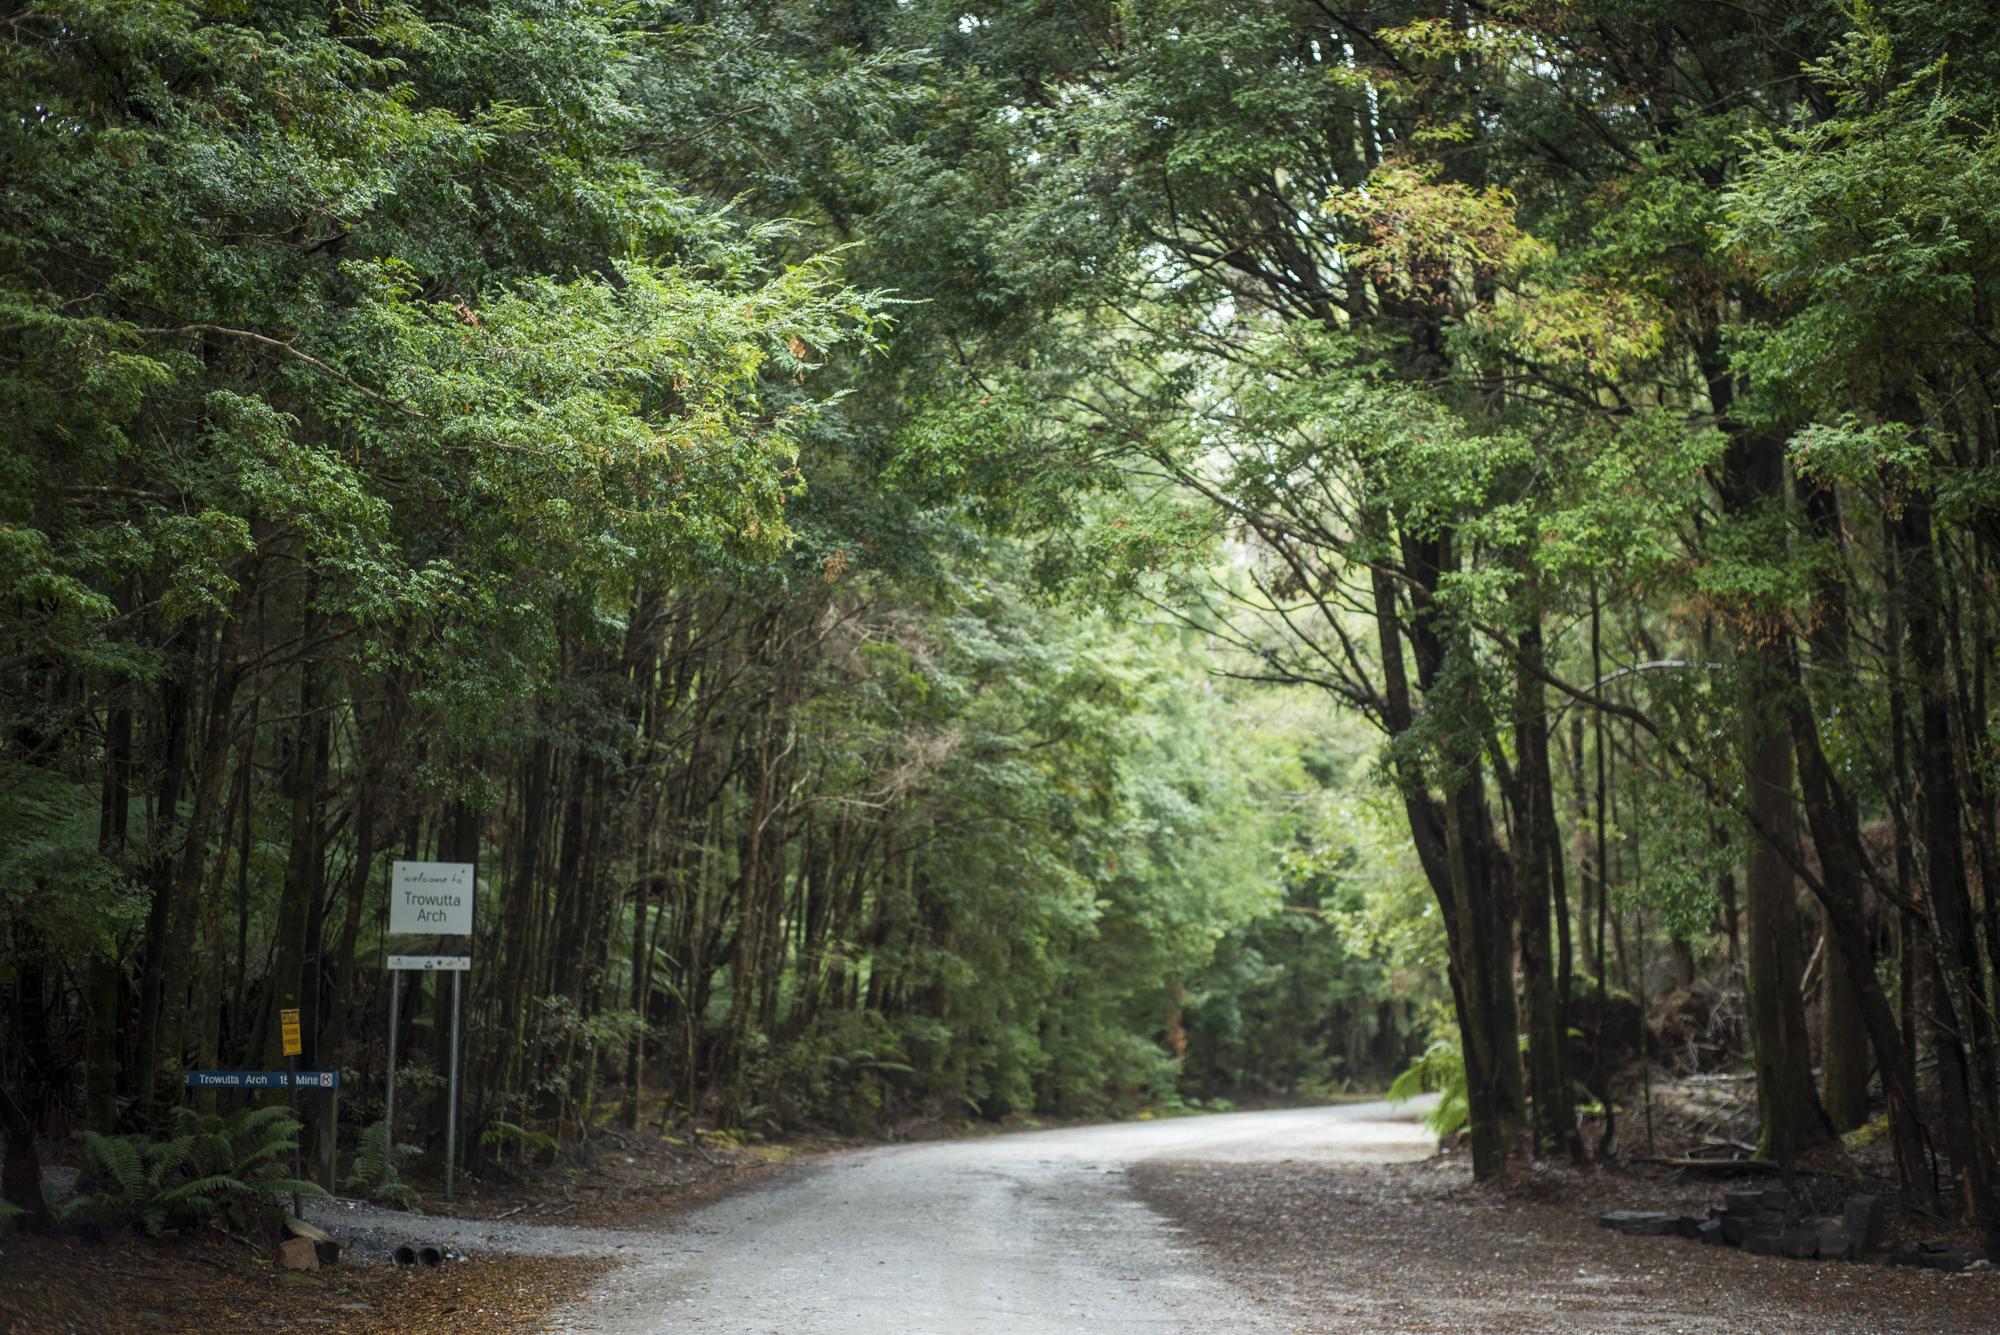 Carpark area at Trowutta Arch entrance.